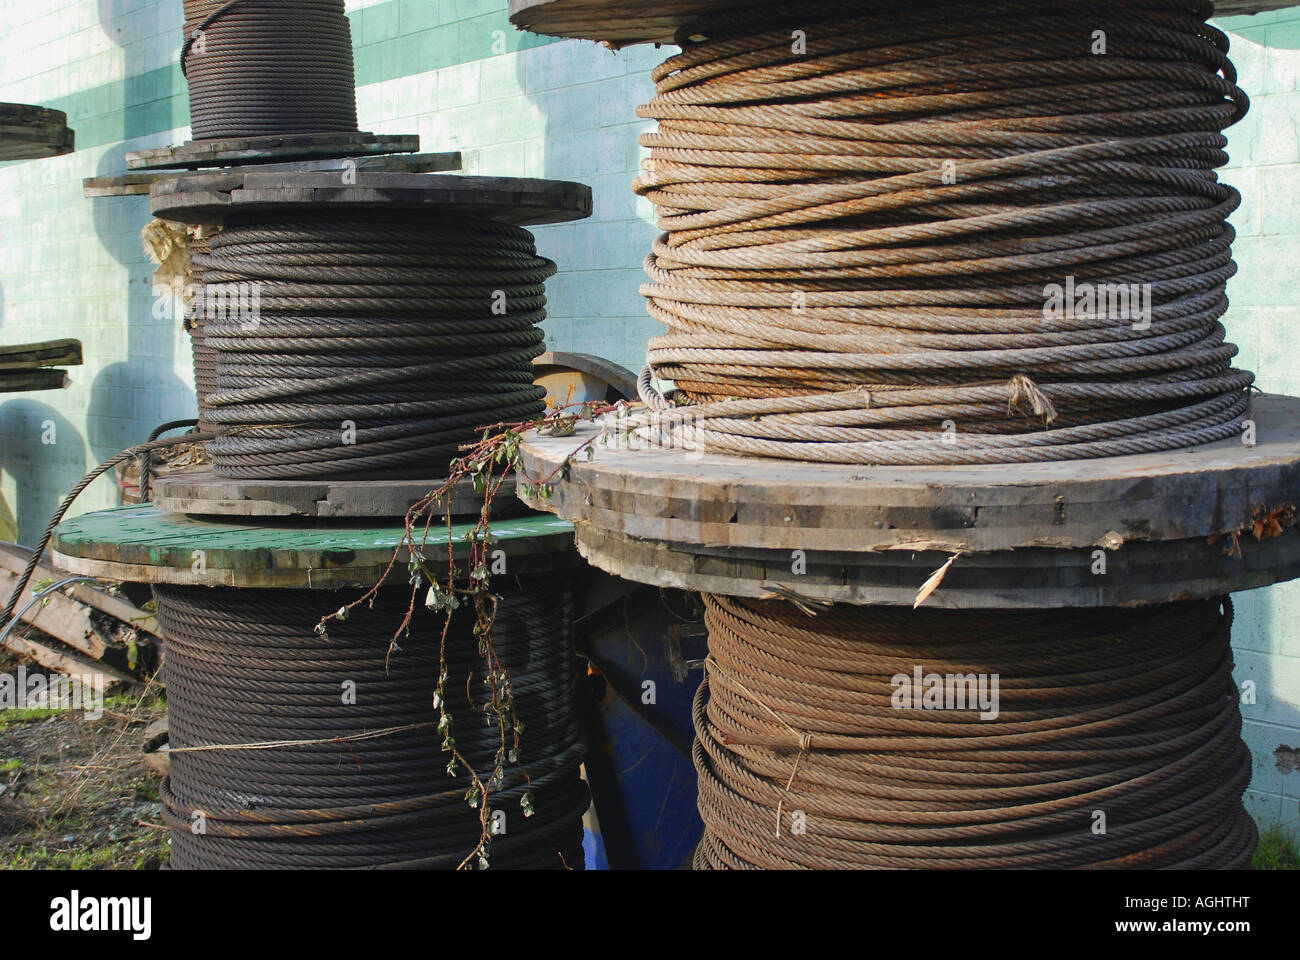 Cable Spools Stockfotos & Cable Spools Bilder - Seite 2 - Alamy